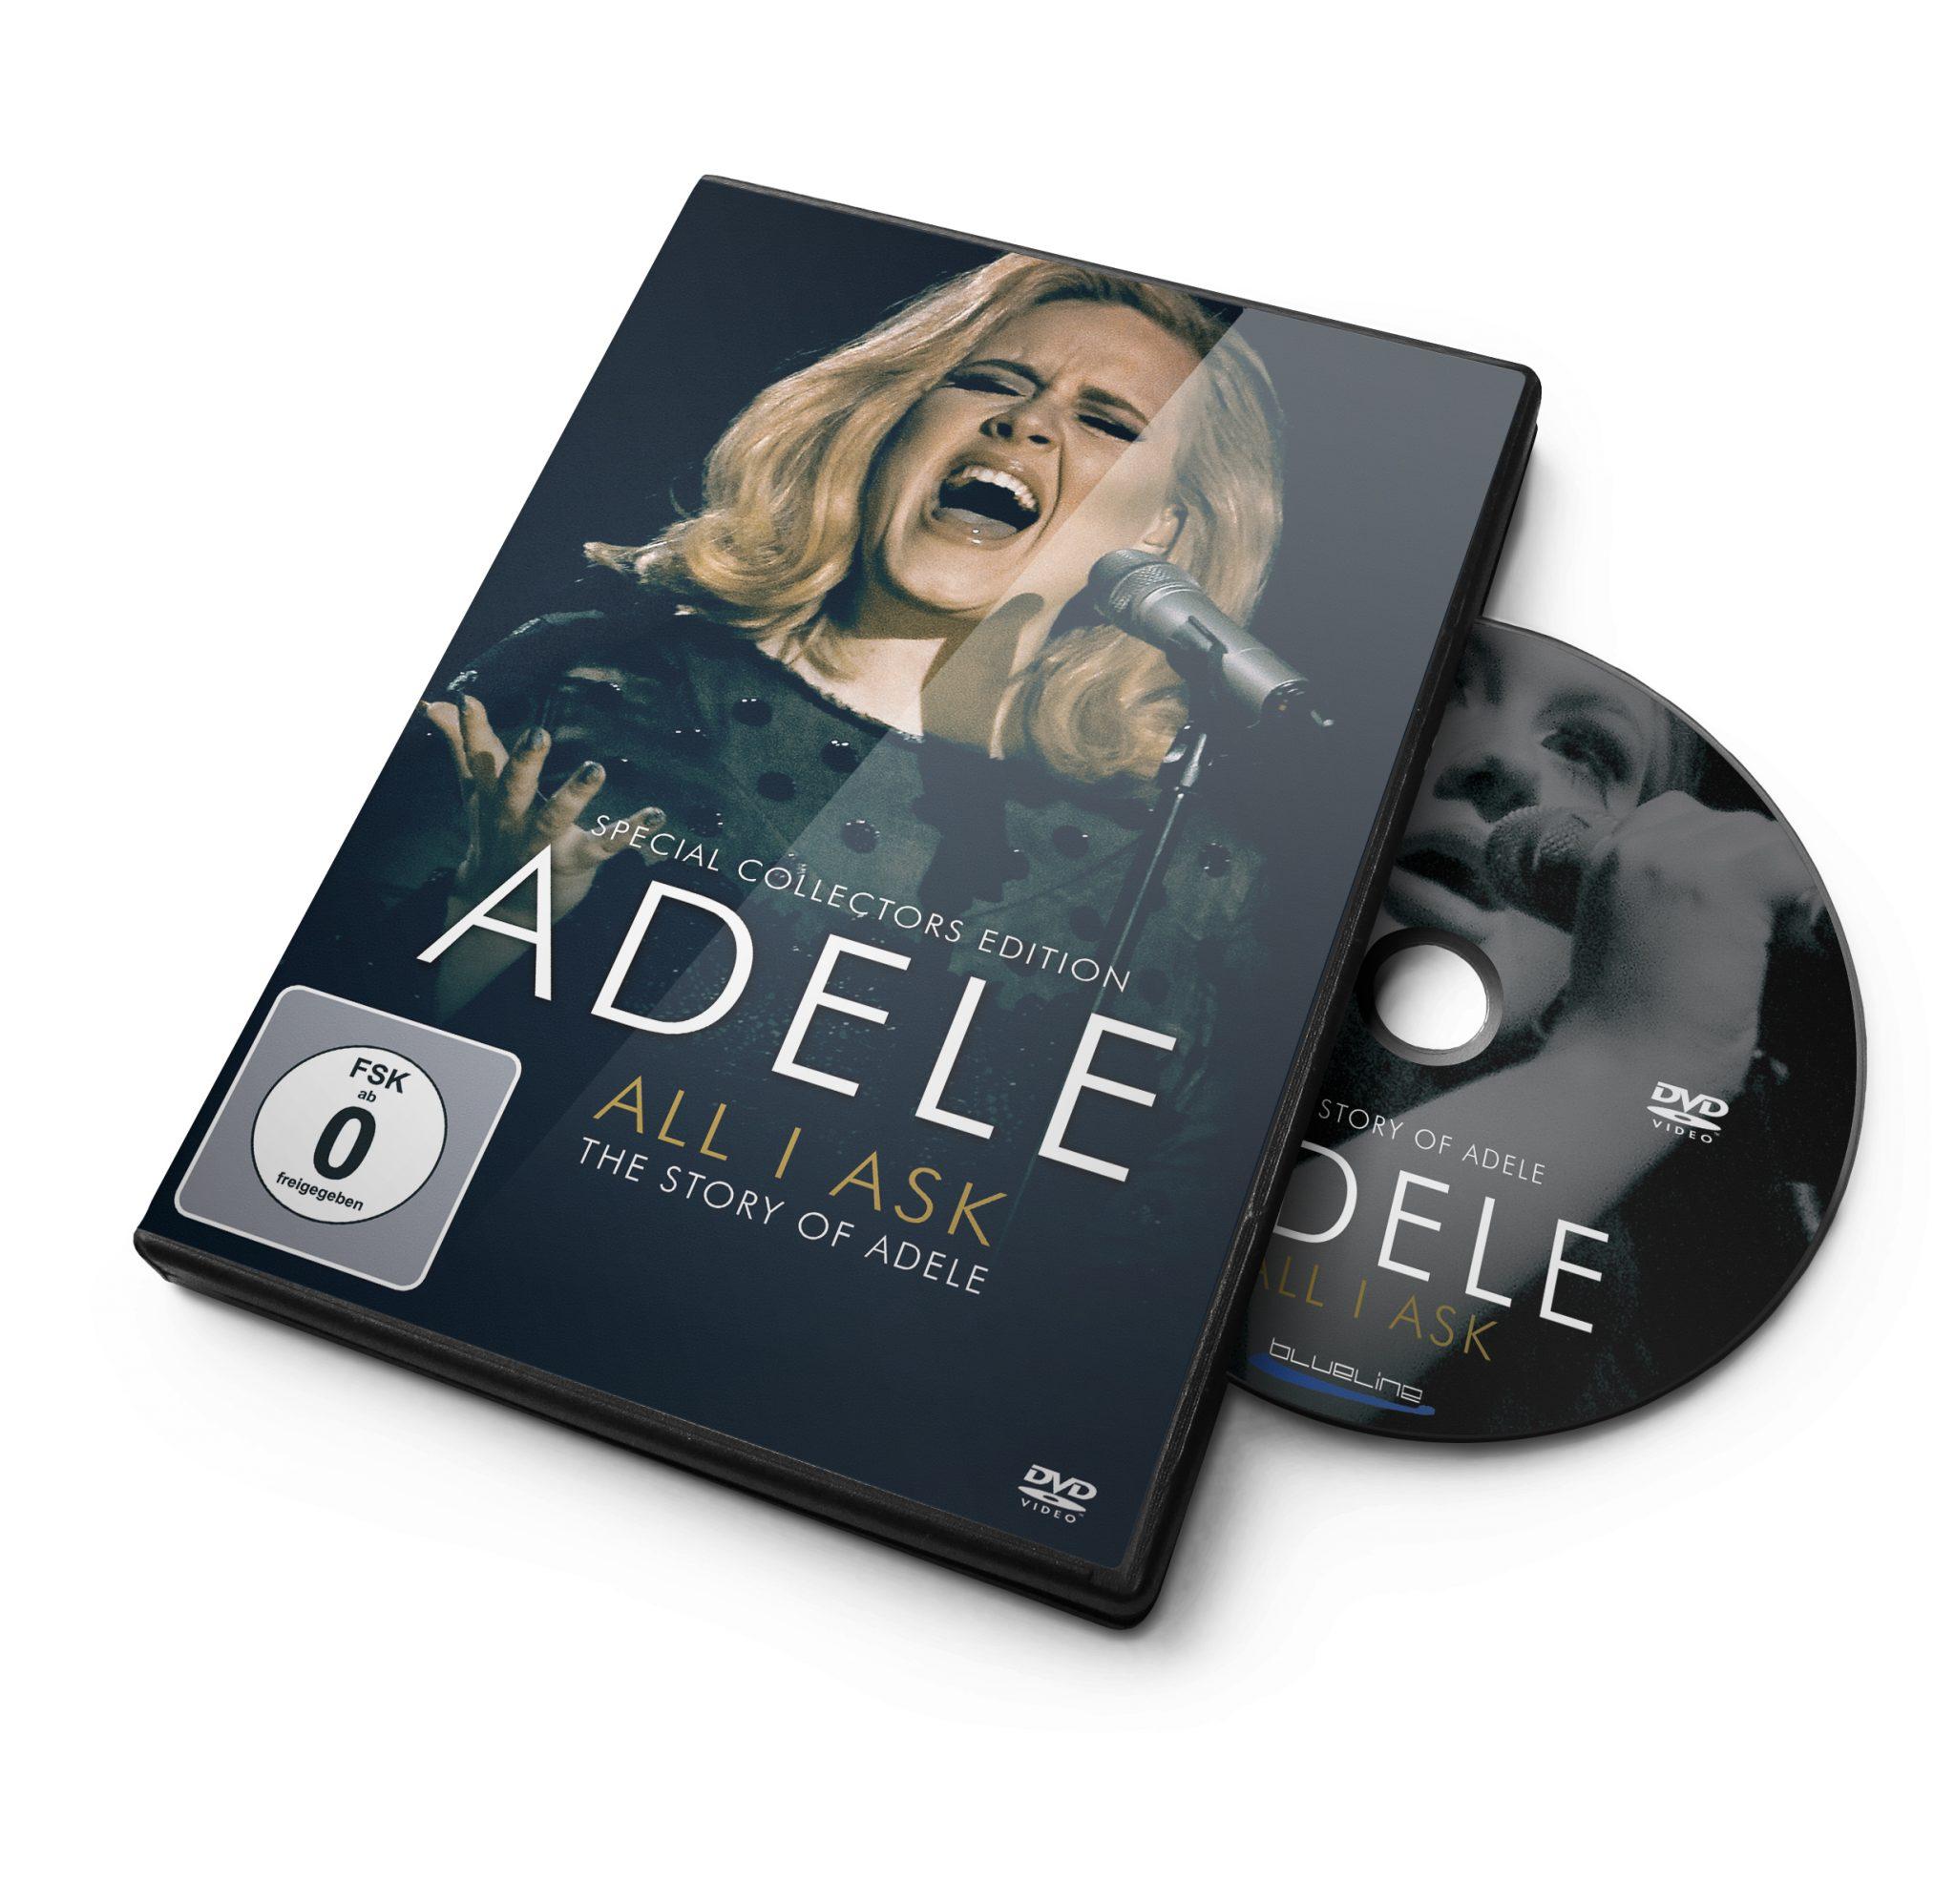 adele_all i ask_dvd